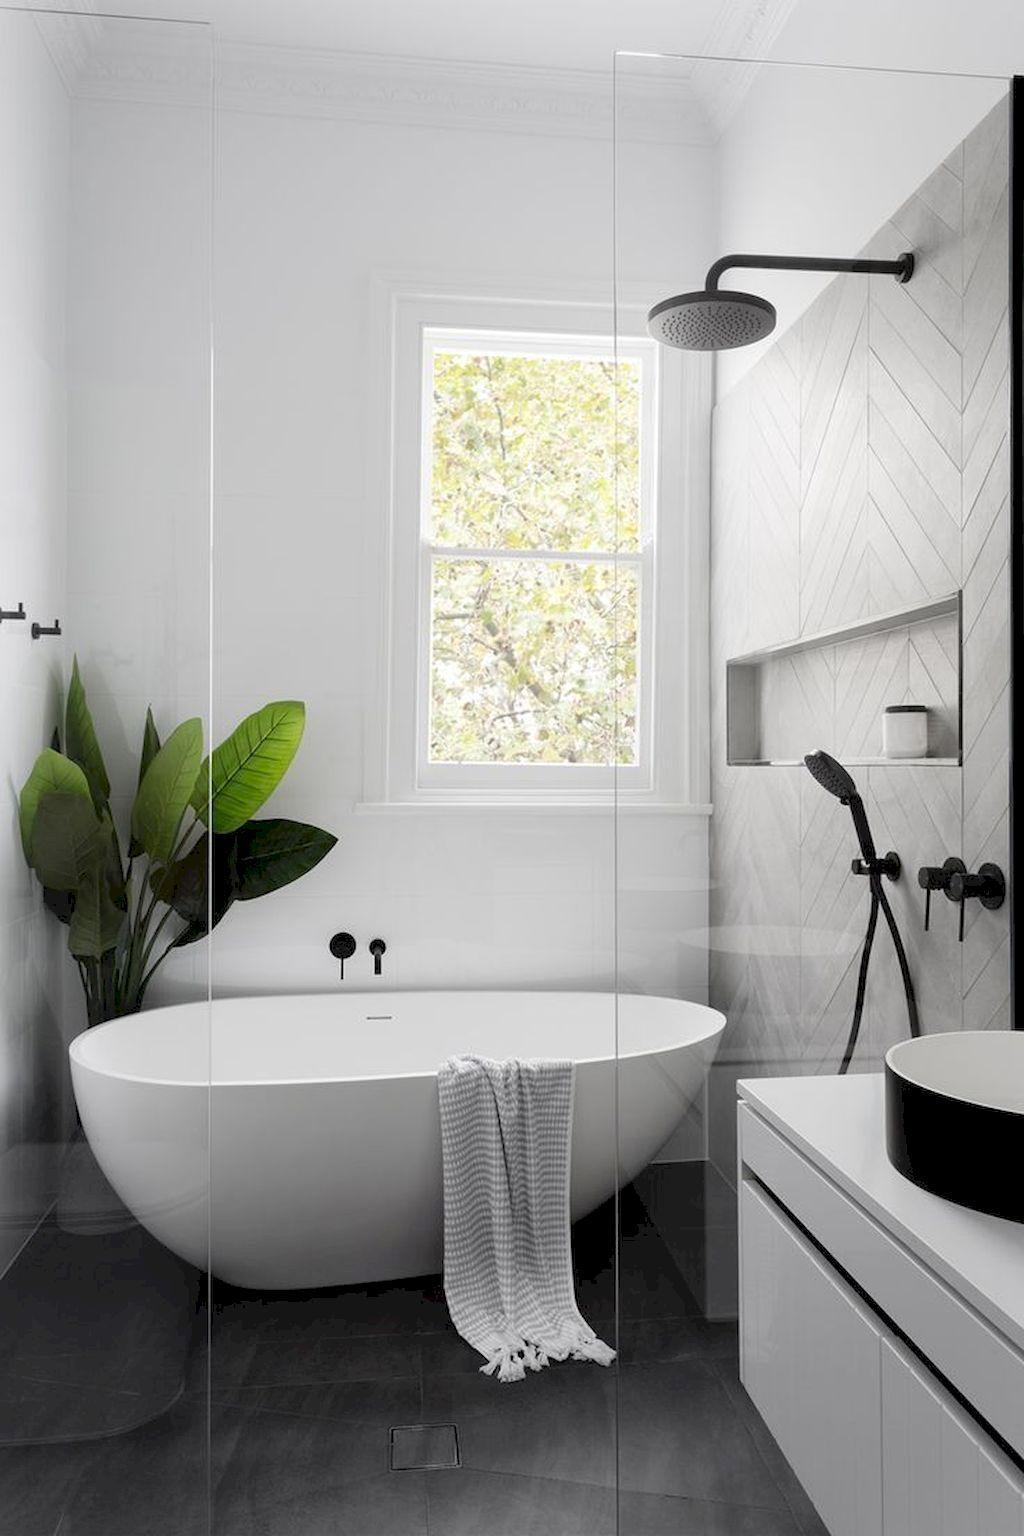 Pin by top home decor design ideas on bathroom ideas pinterest